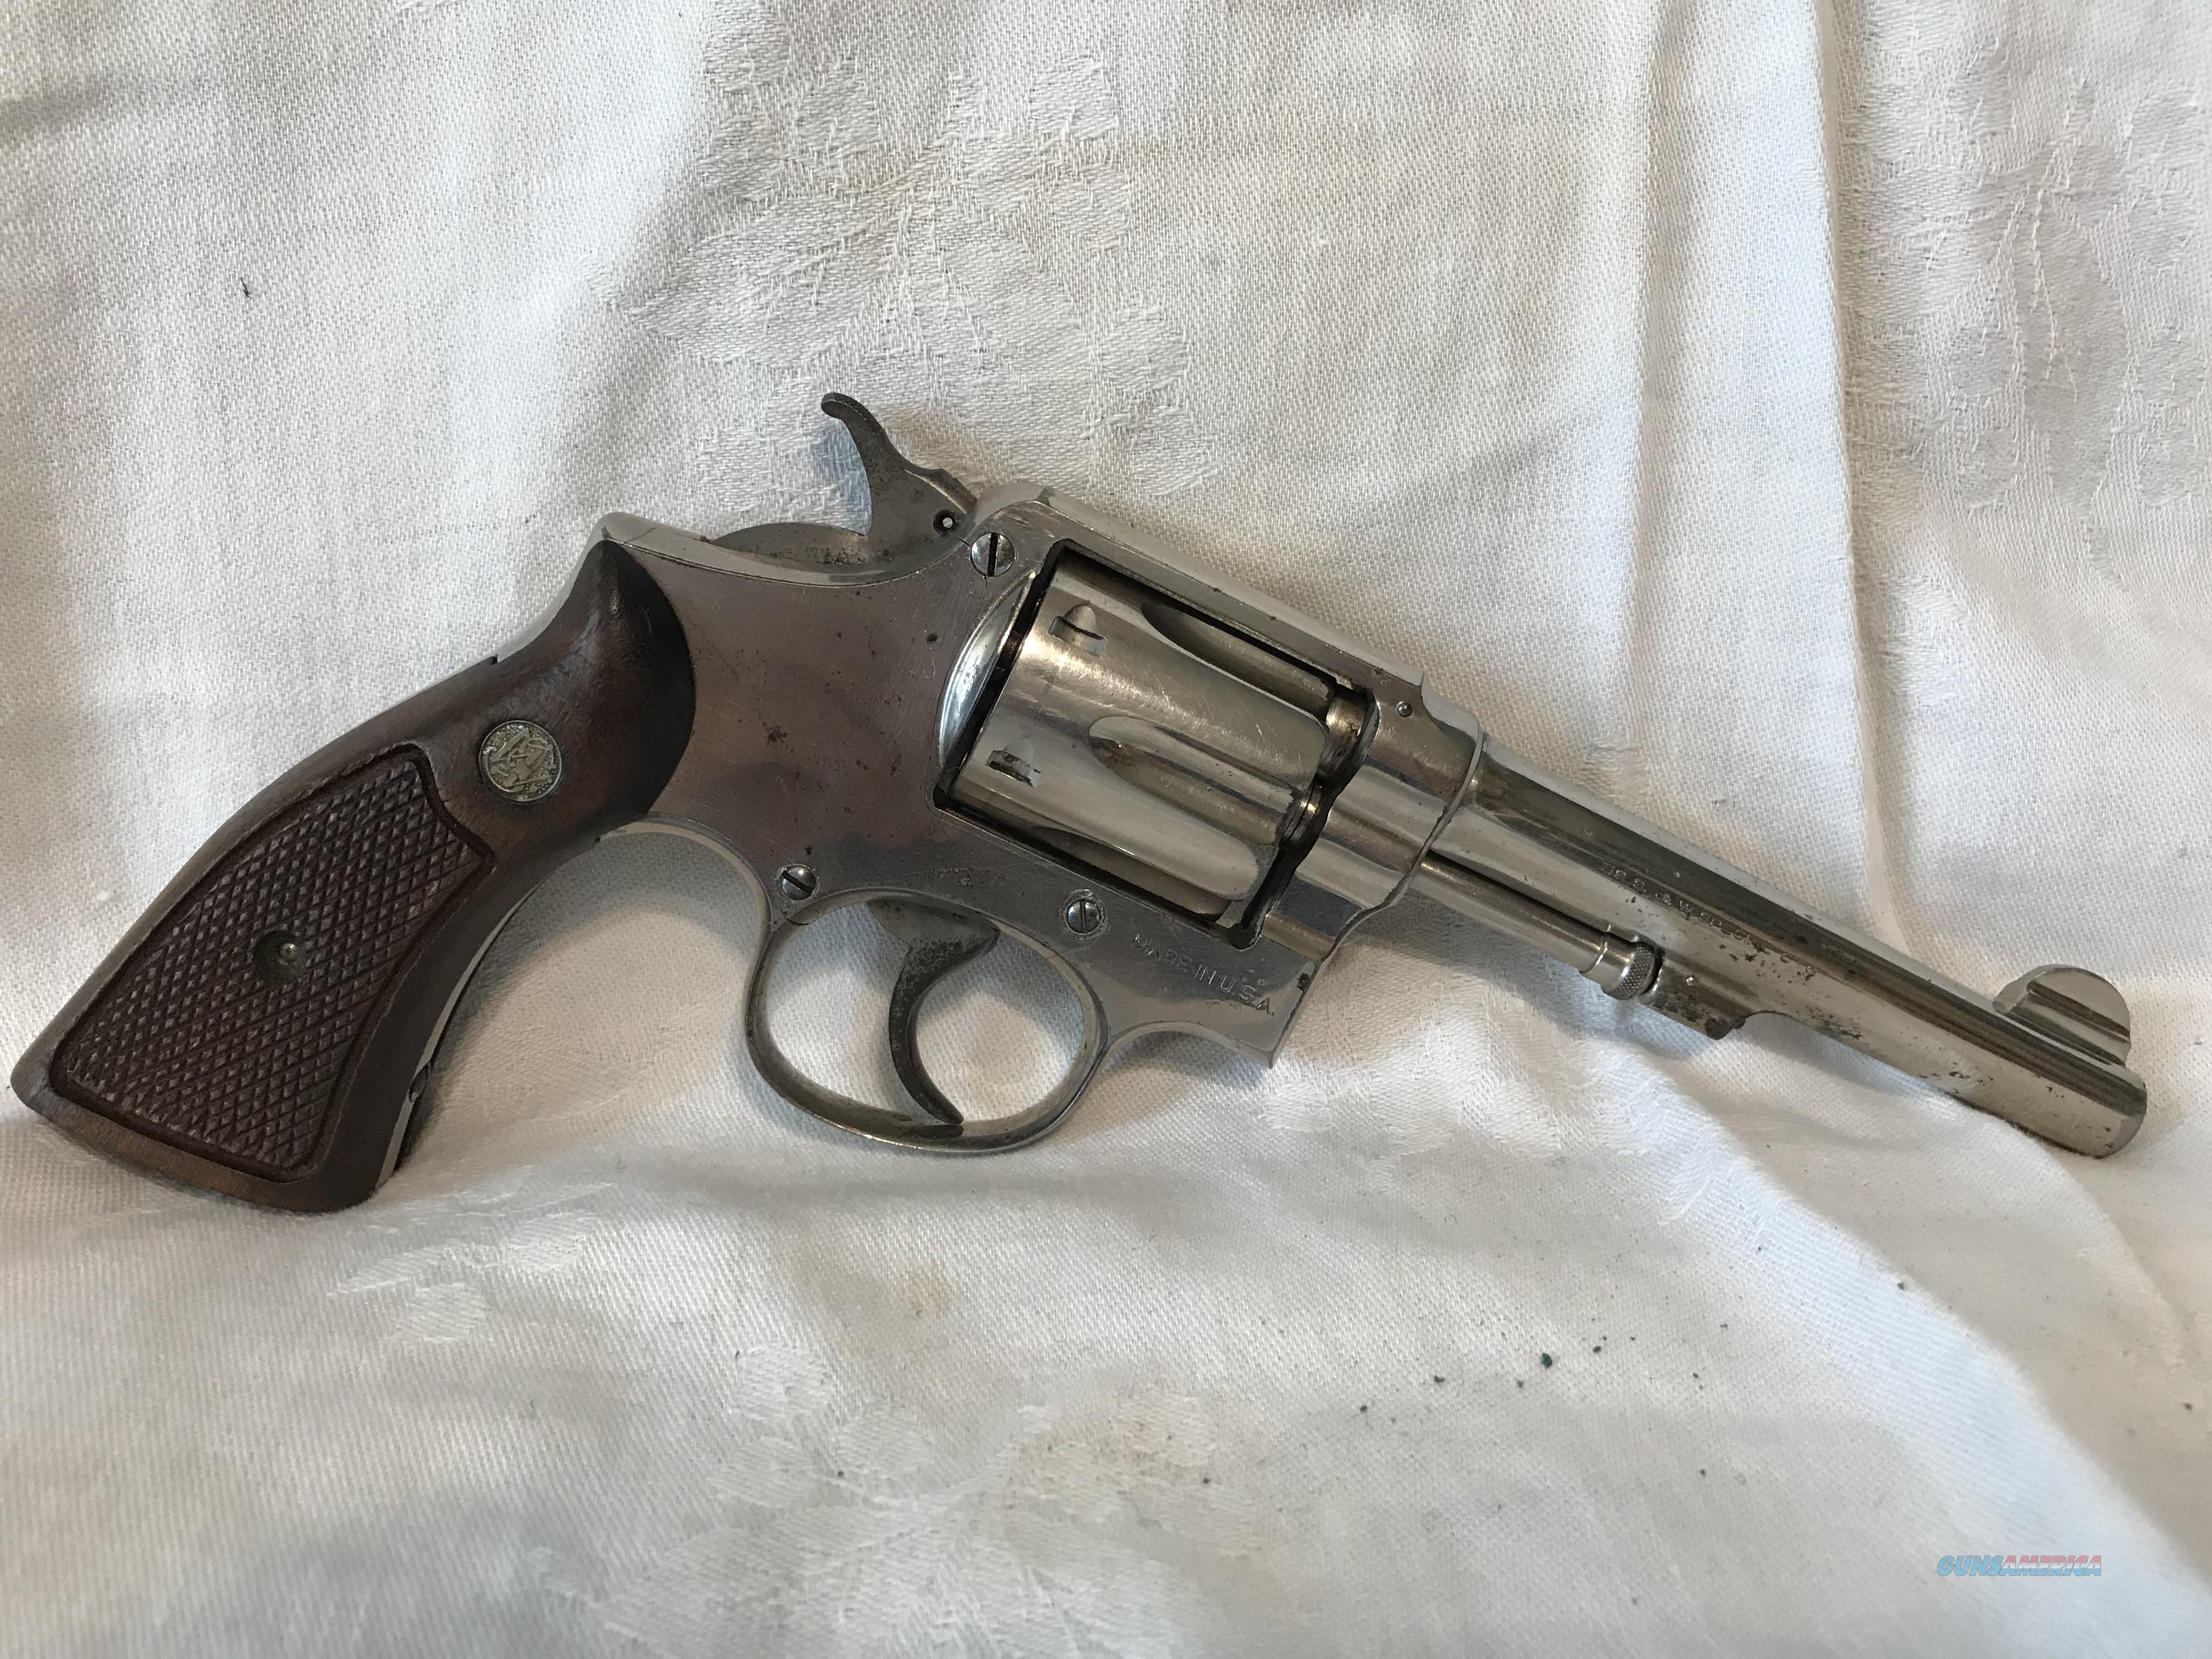 Smith & Wesson 38 Special Prewar 1905 4th Change  Guns > Pistols > Smith & Wesson Revolvers > Pre-1945